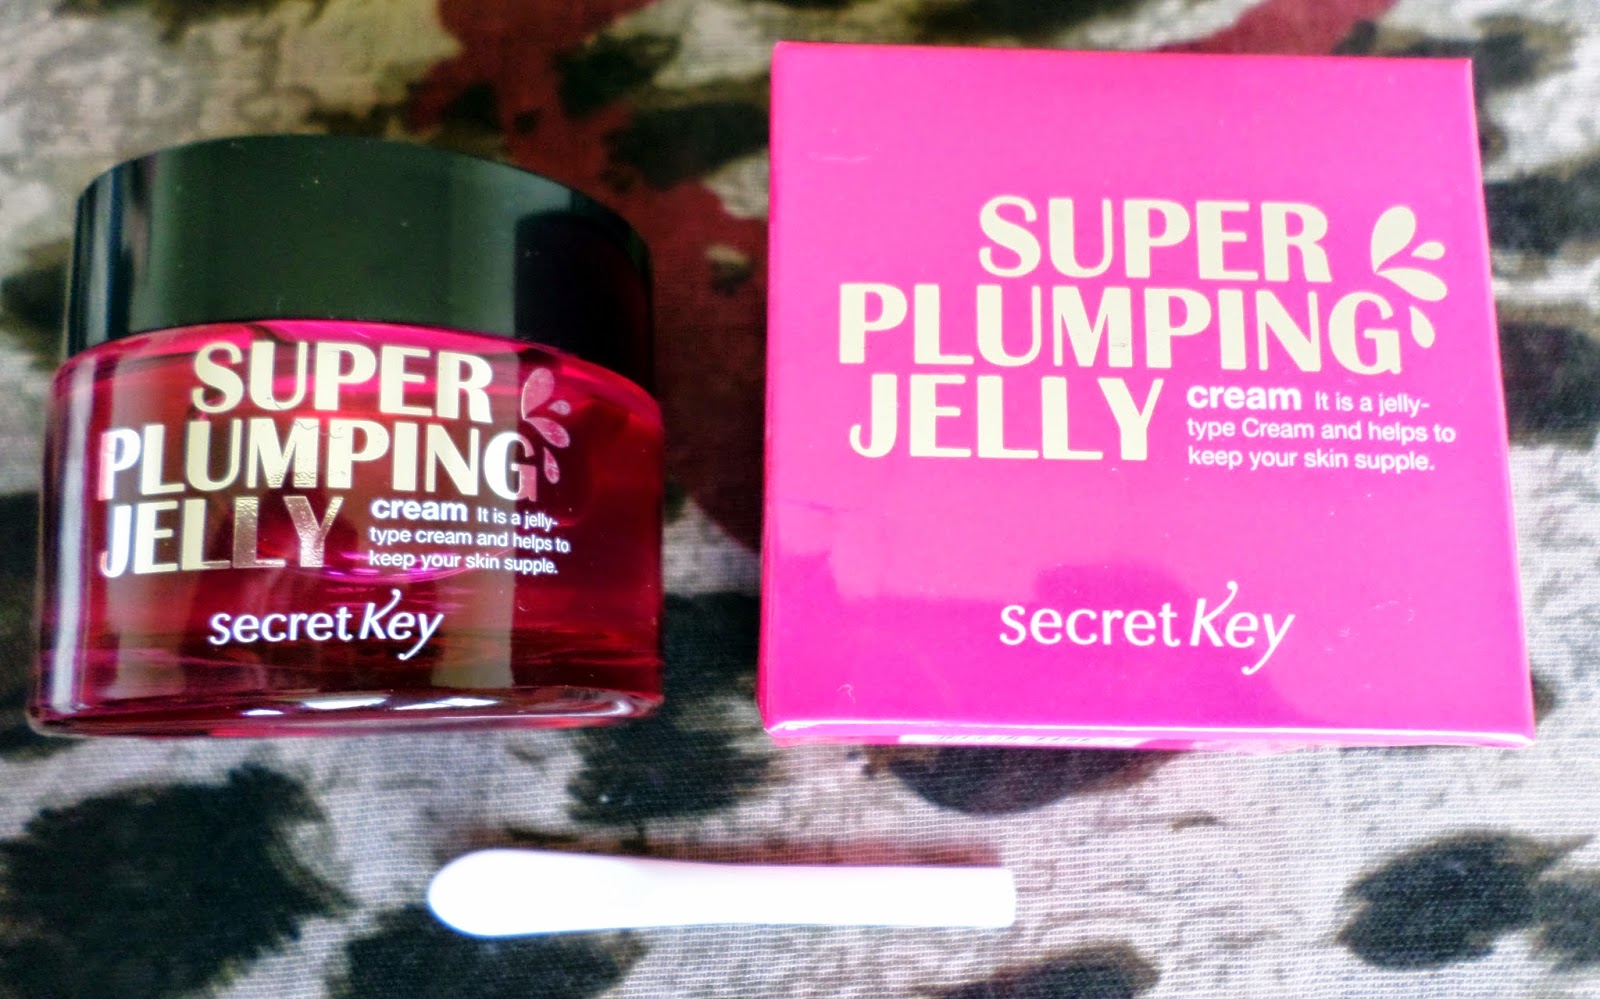 Secret Key Super Plumping Jelly Cream 50ml